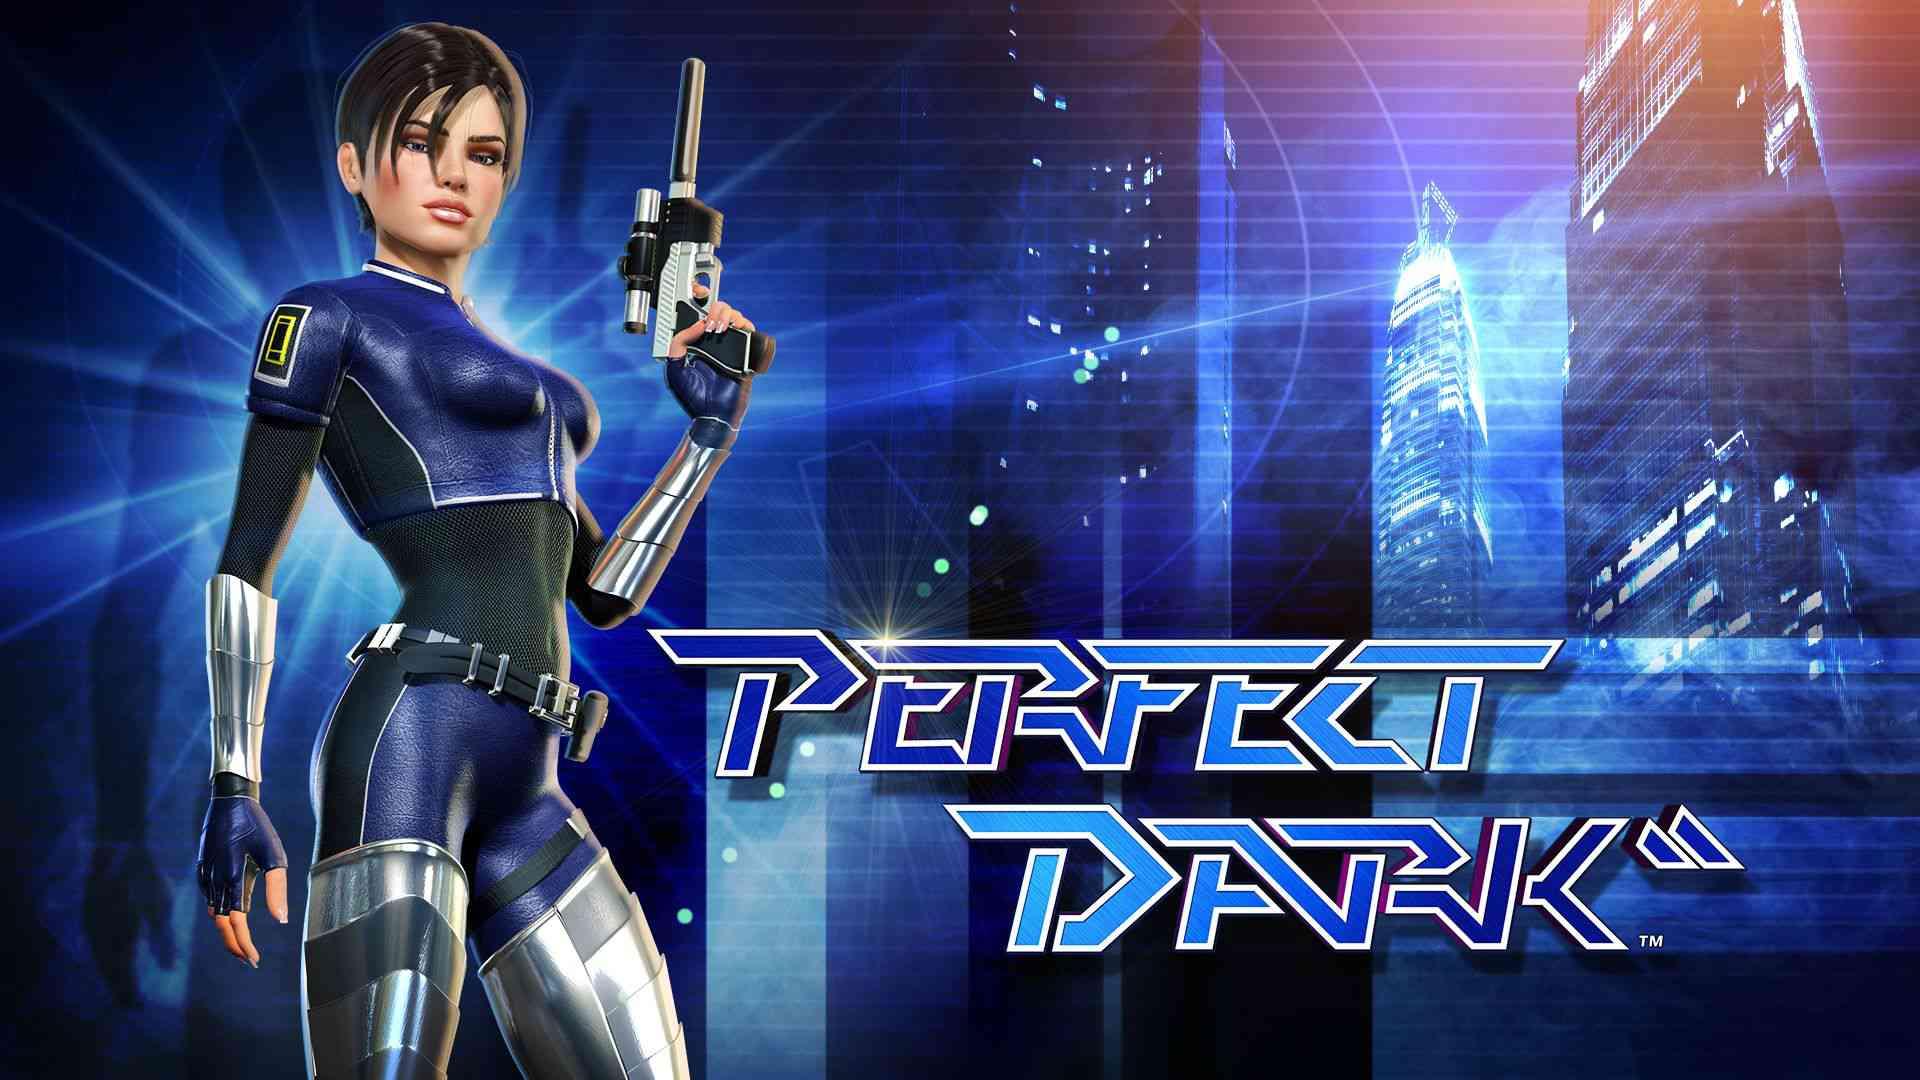 Perfect Dark logo poster